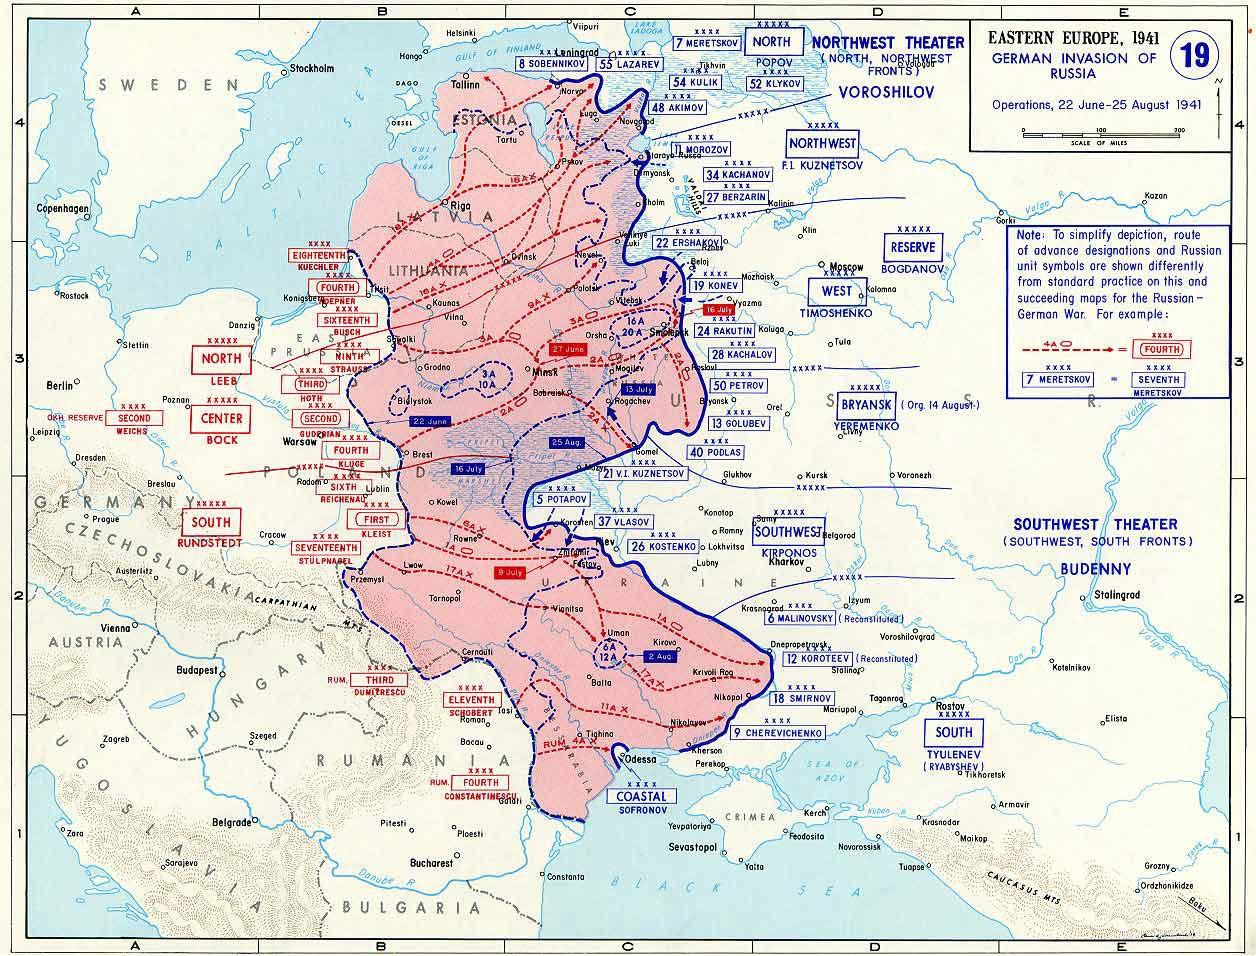 Stalingrad Karte Europa.Map Map Of Operation Barbarossa 22 Jun To 25 Aug 1941 Battle